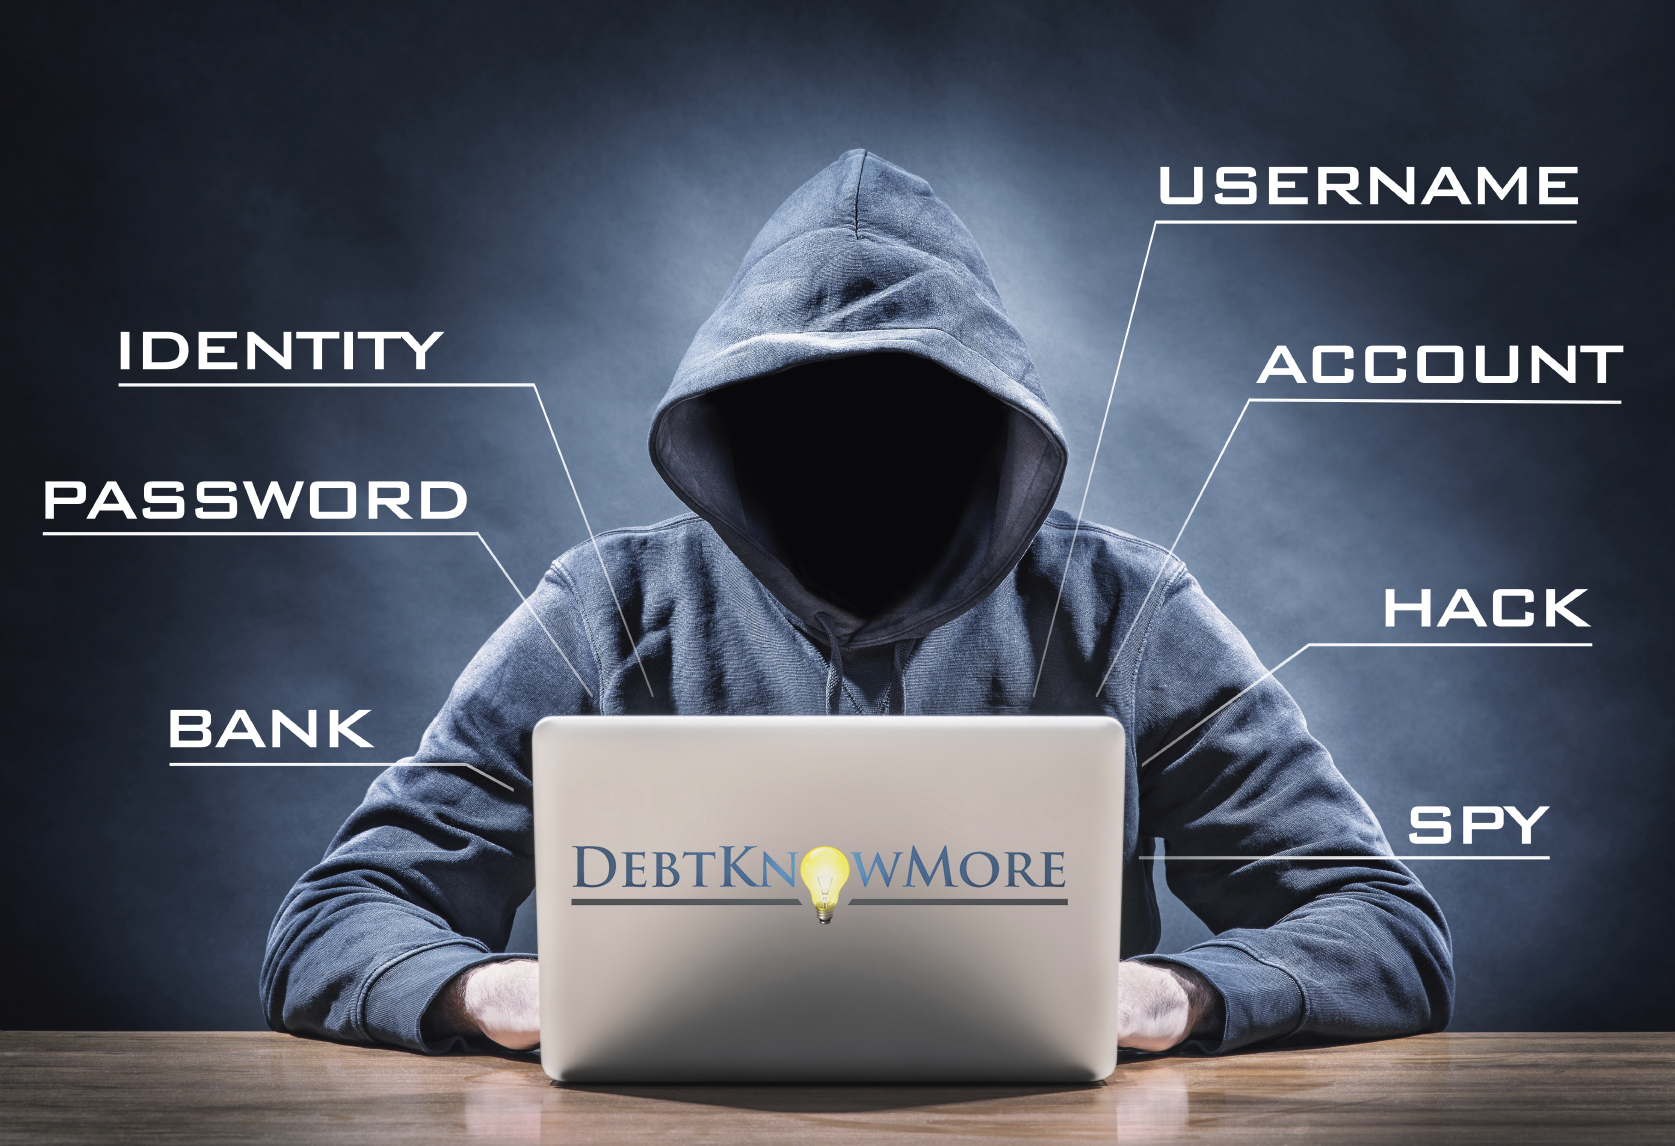 identity Theft on emaze